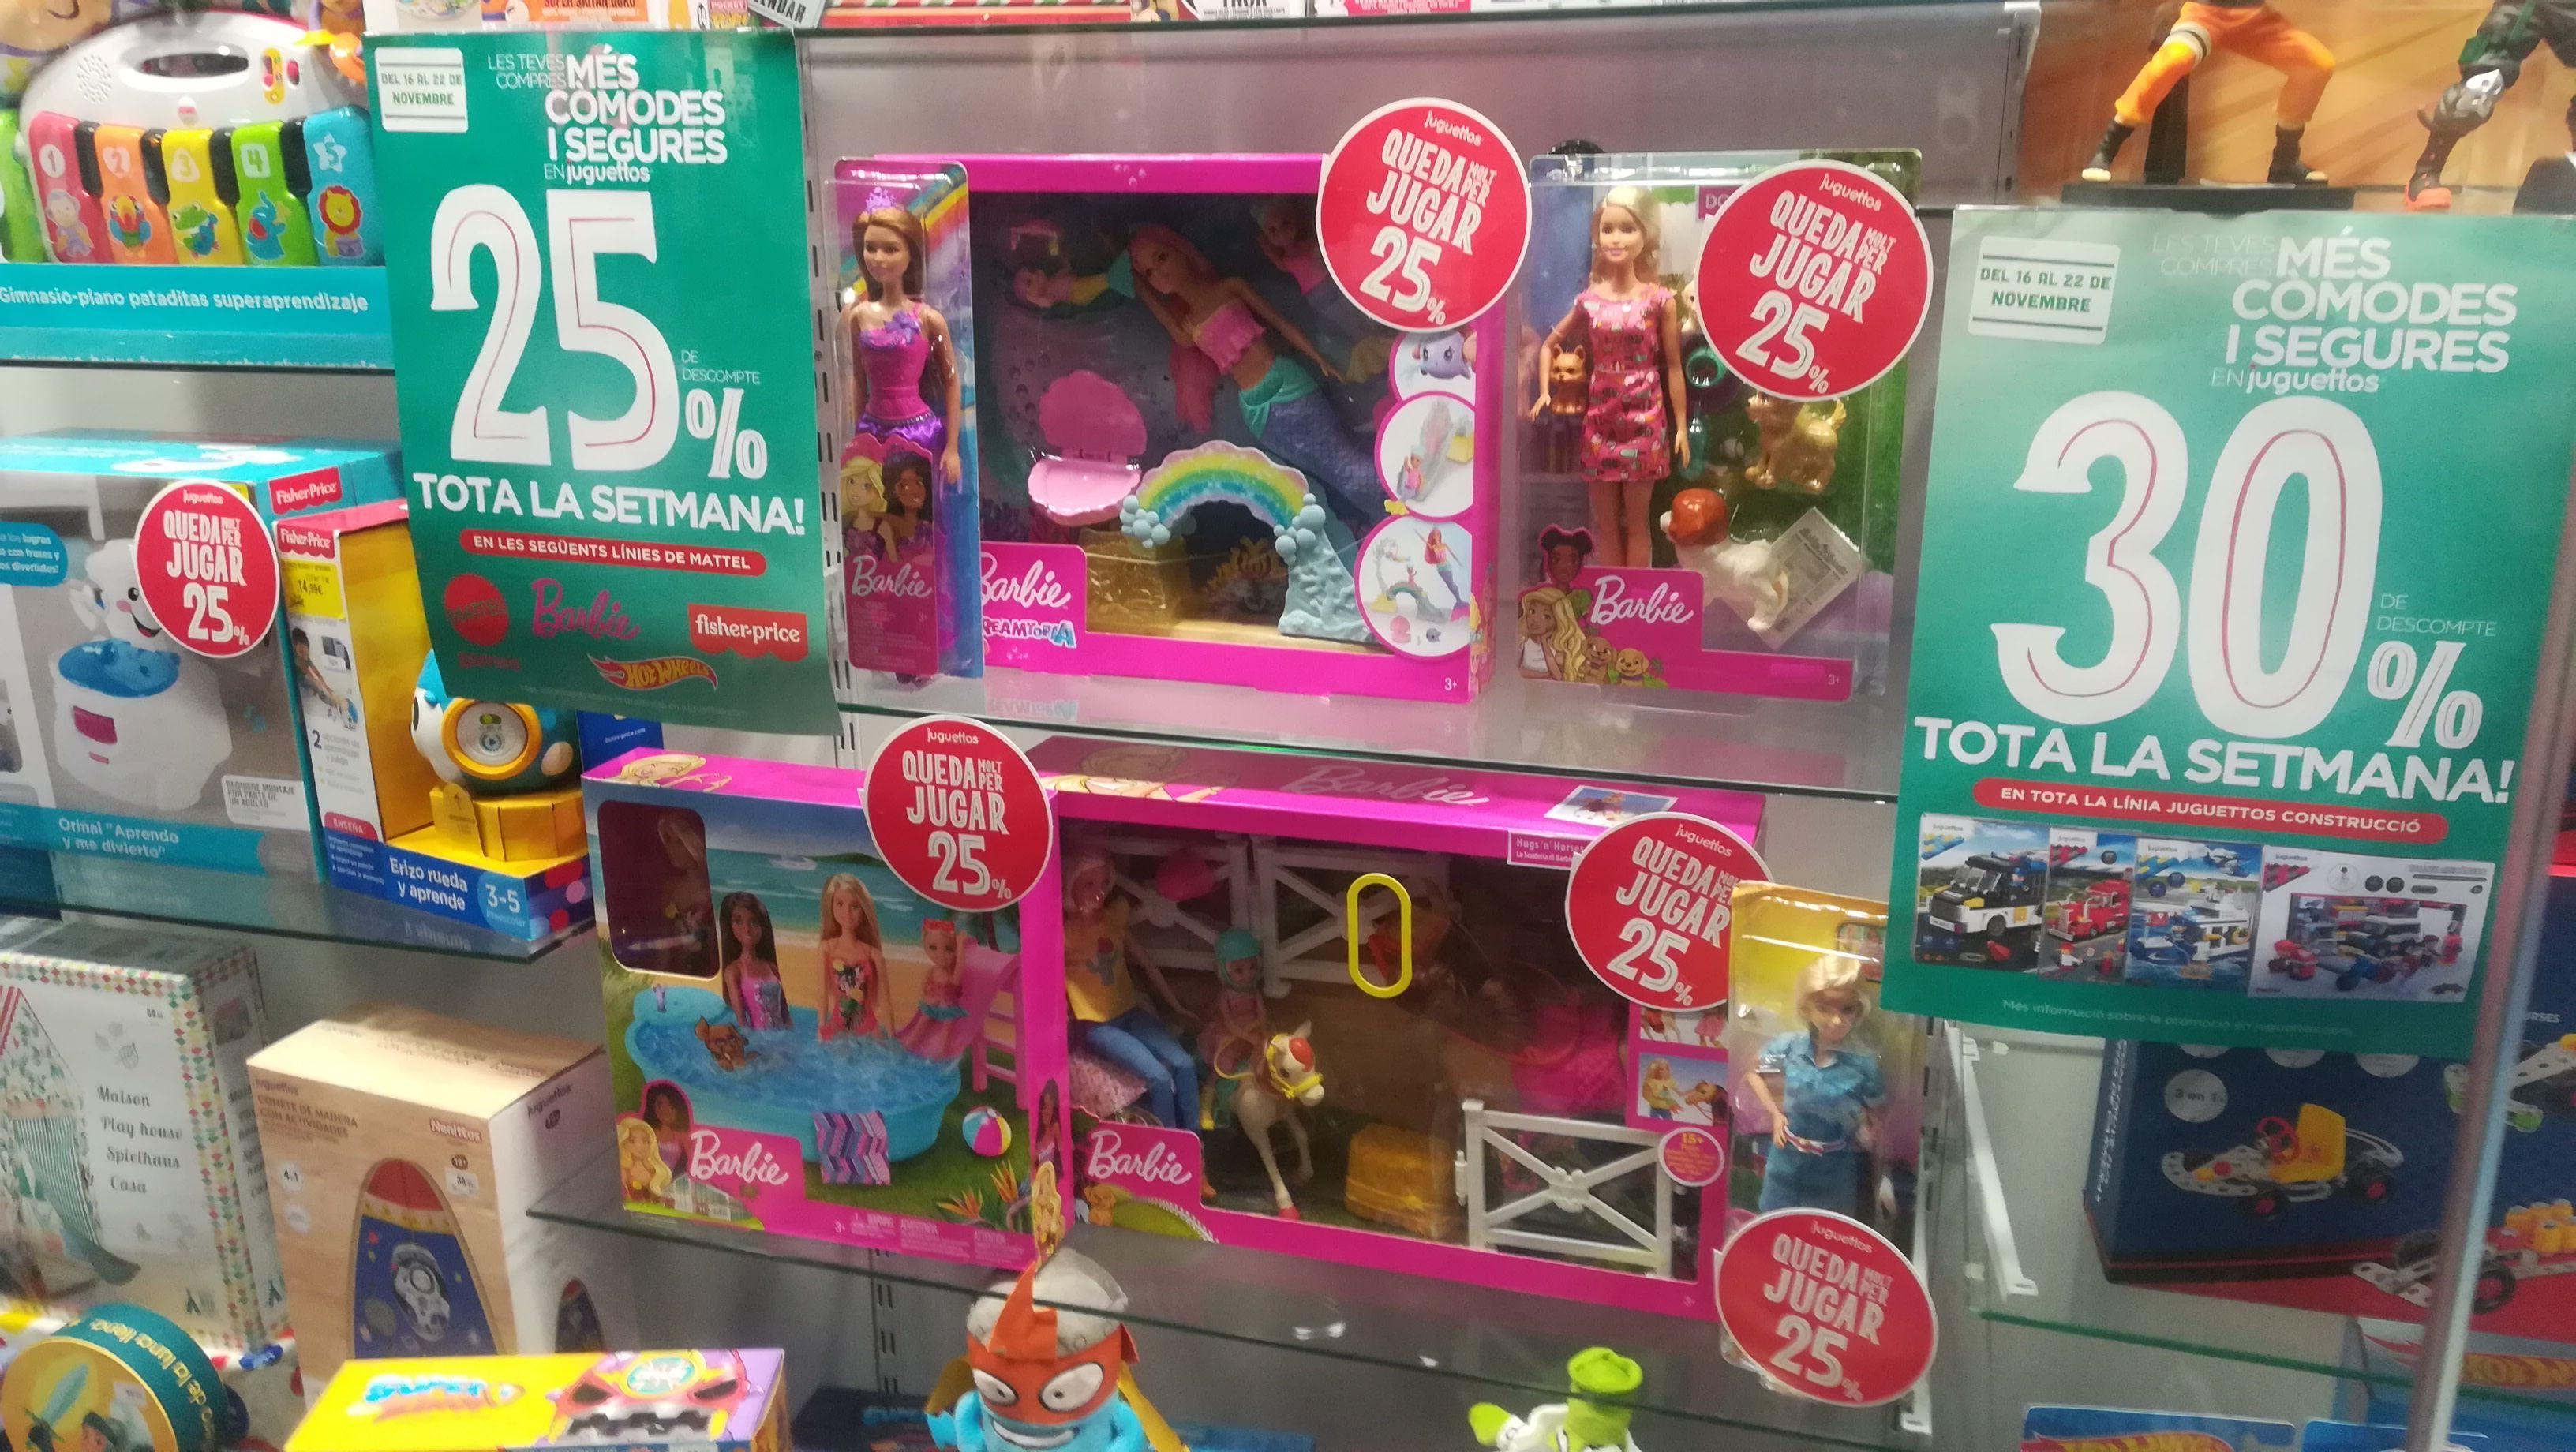 Barbie 25% descuento